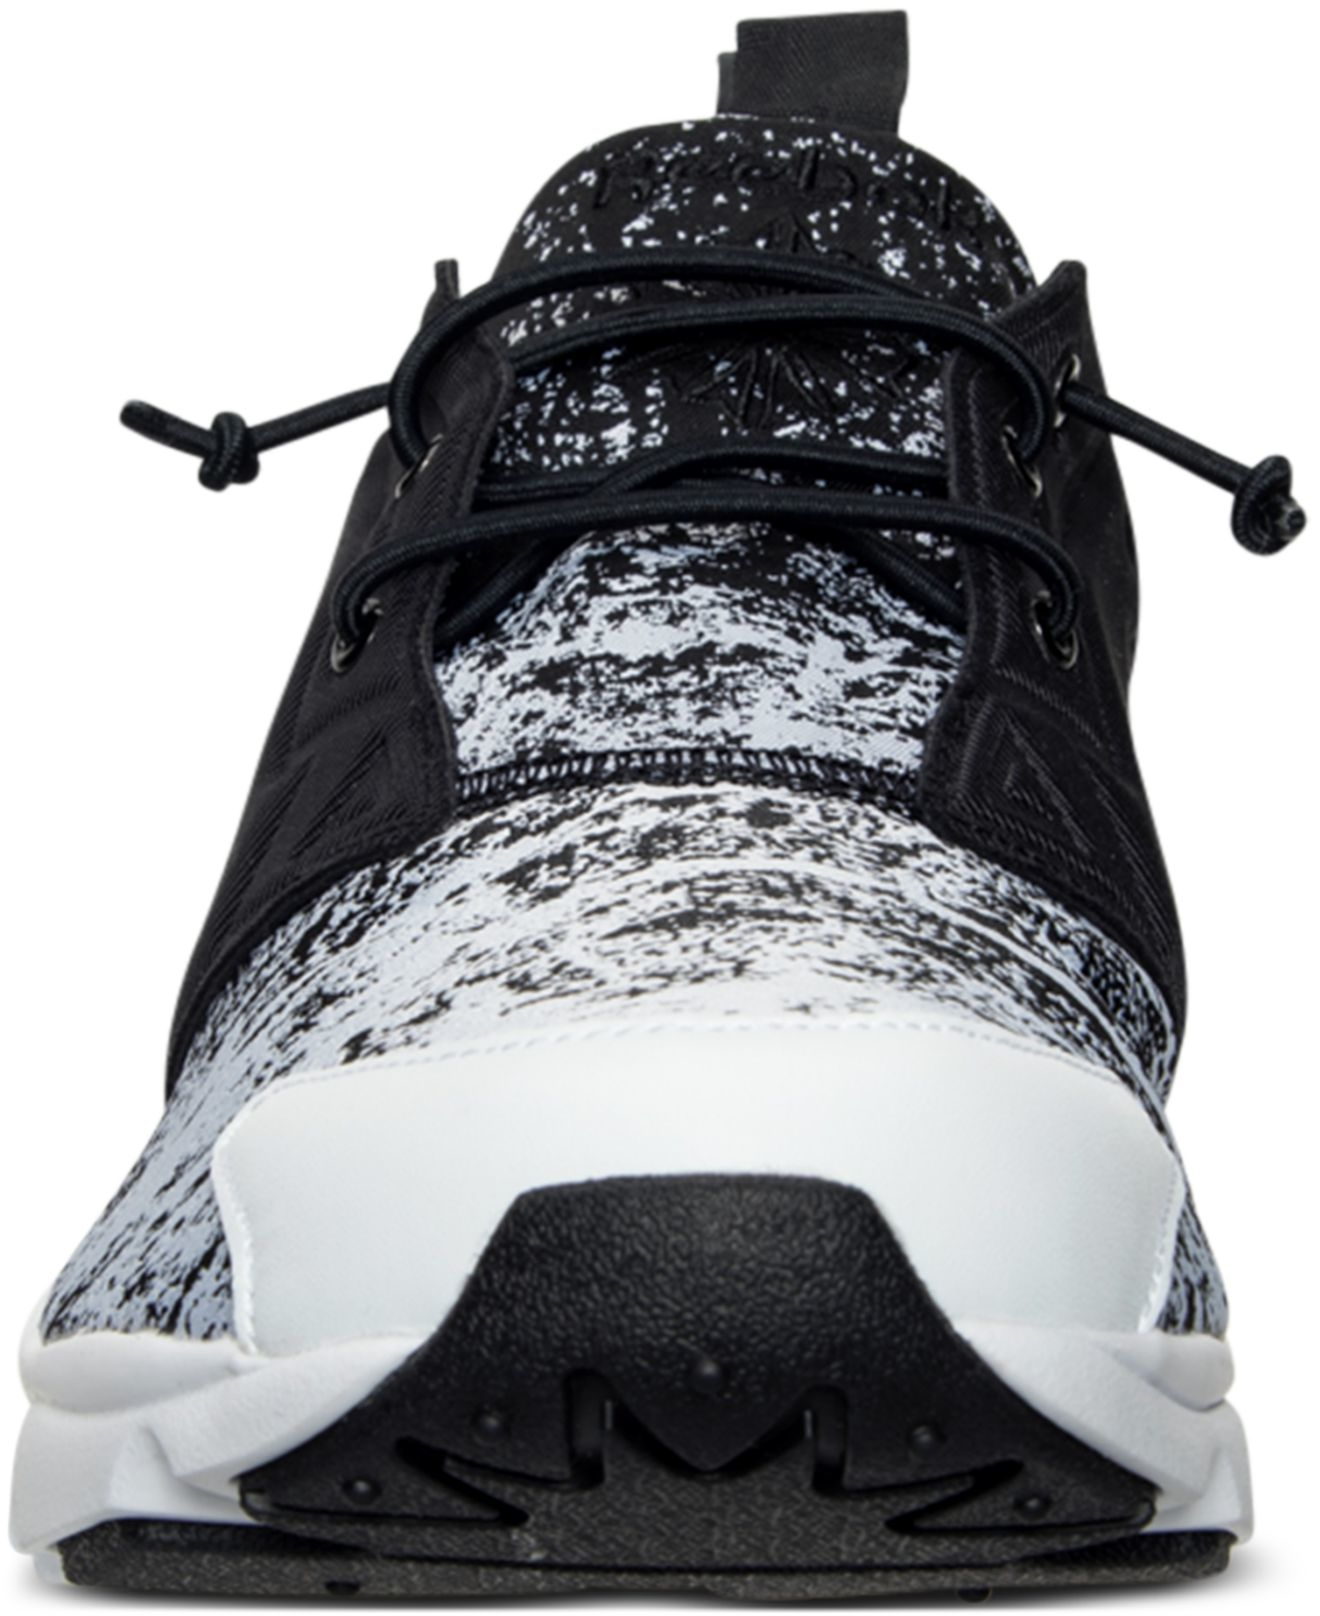 e6a8f5f39345 Lyst - Reebok Men s Furylite Jacquard Print Casual Sneakers From ...